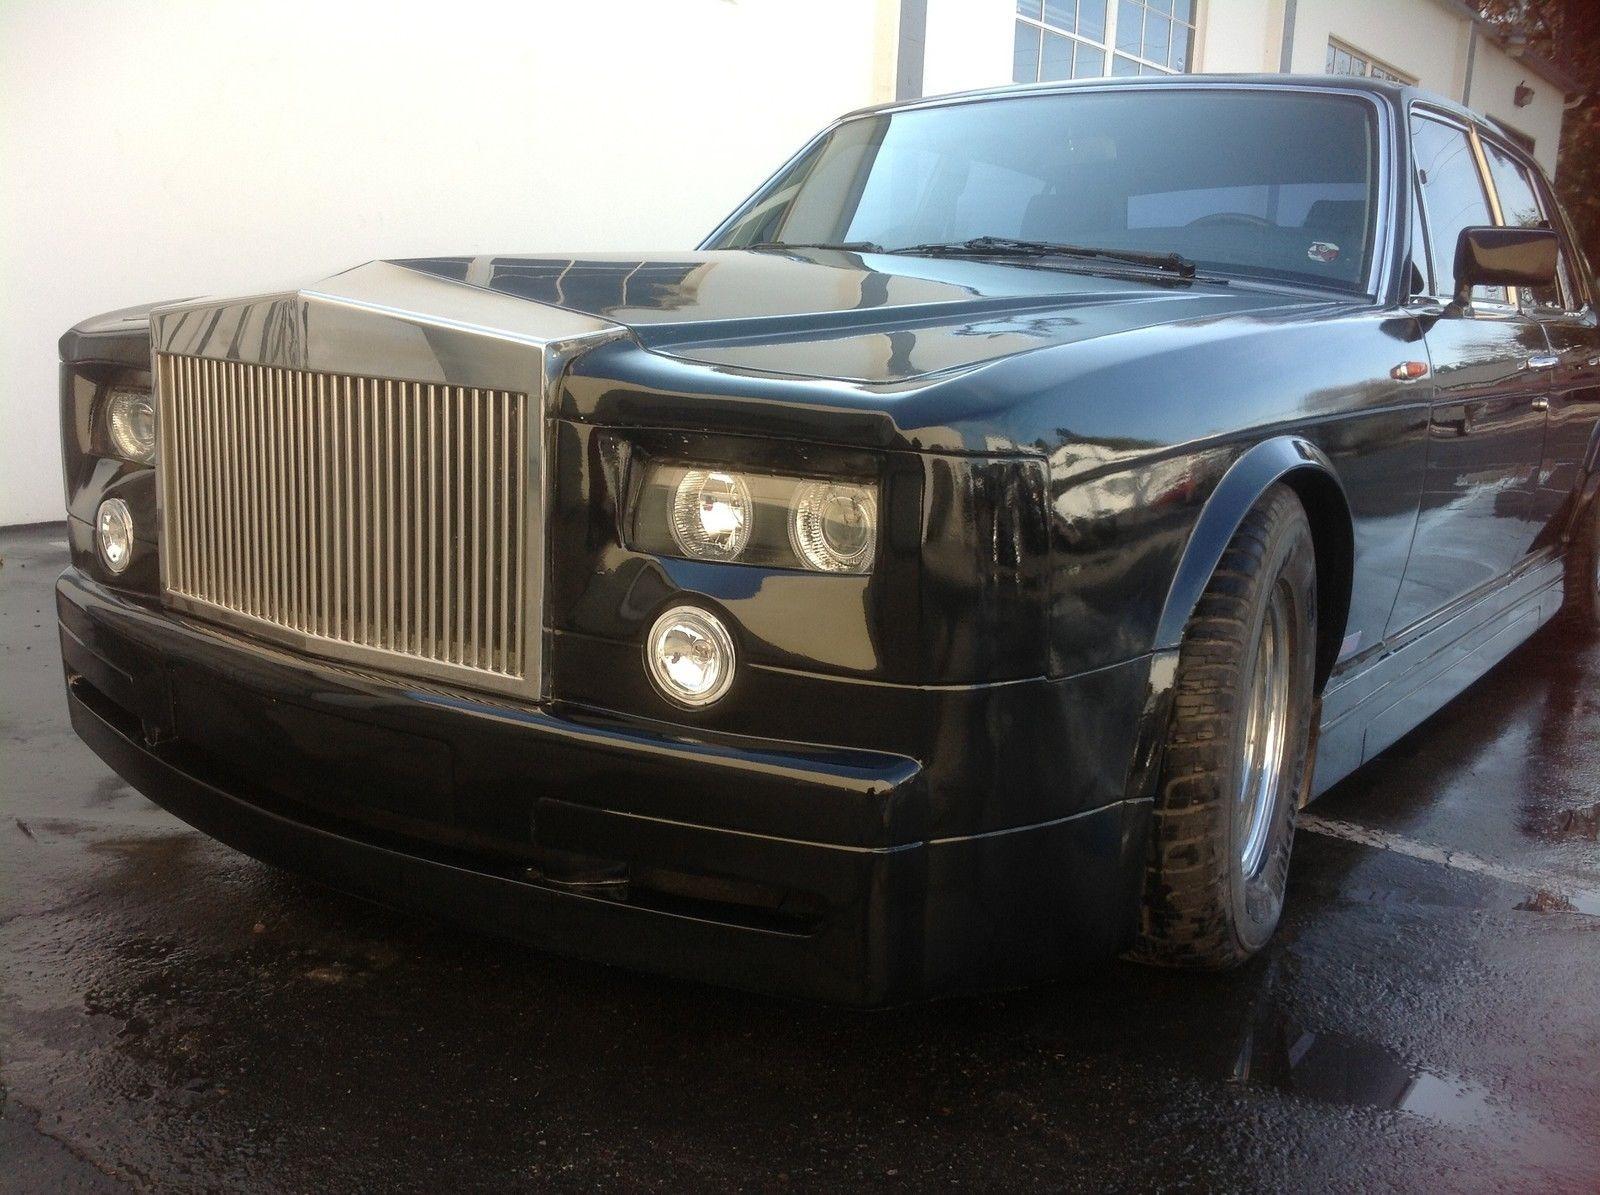 Bentley-Phantom-1%25255B2%25255D.jpg